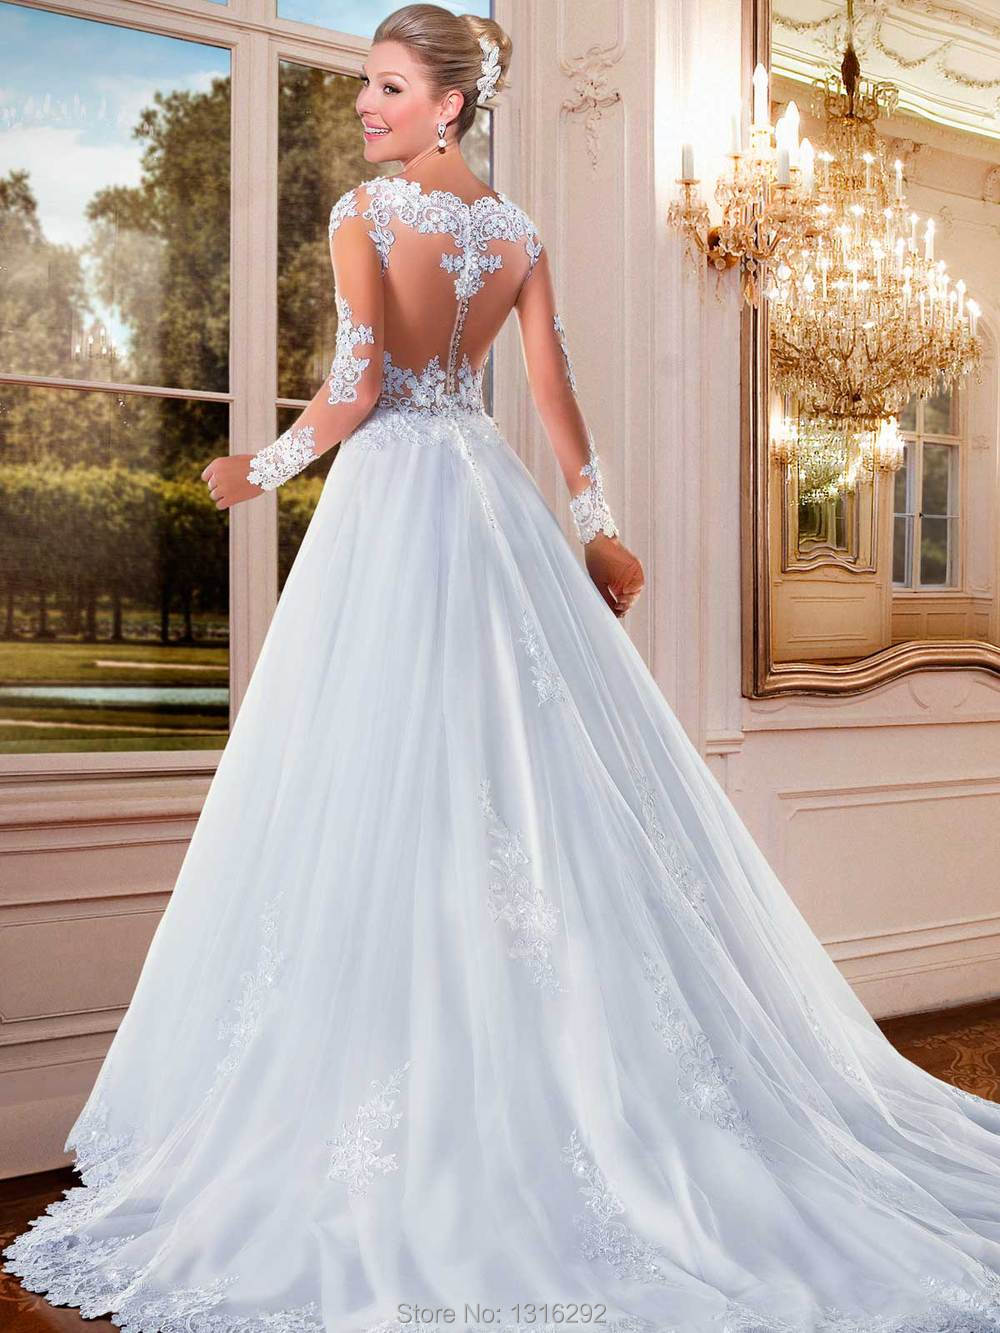 Nice Corset Princess Wedding Dresses Crest - Wedding Dress Ideas ...